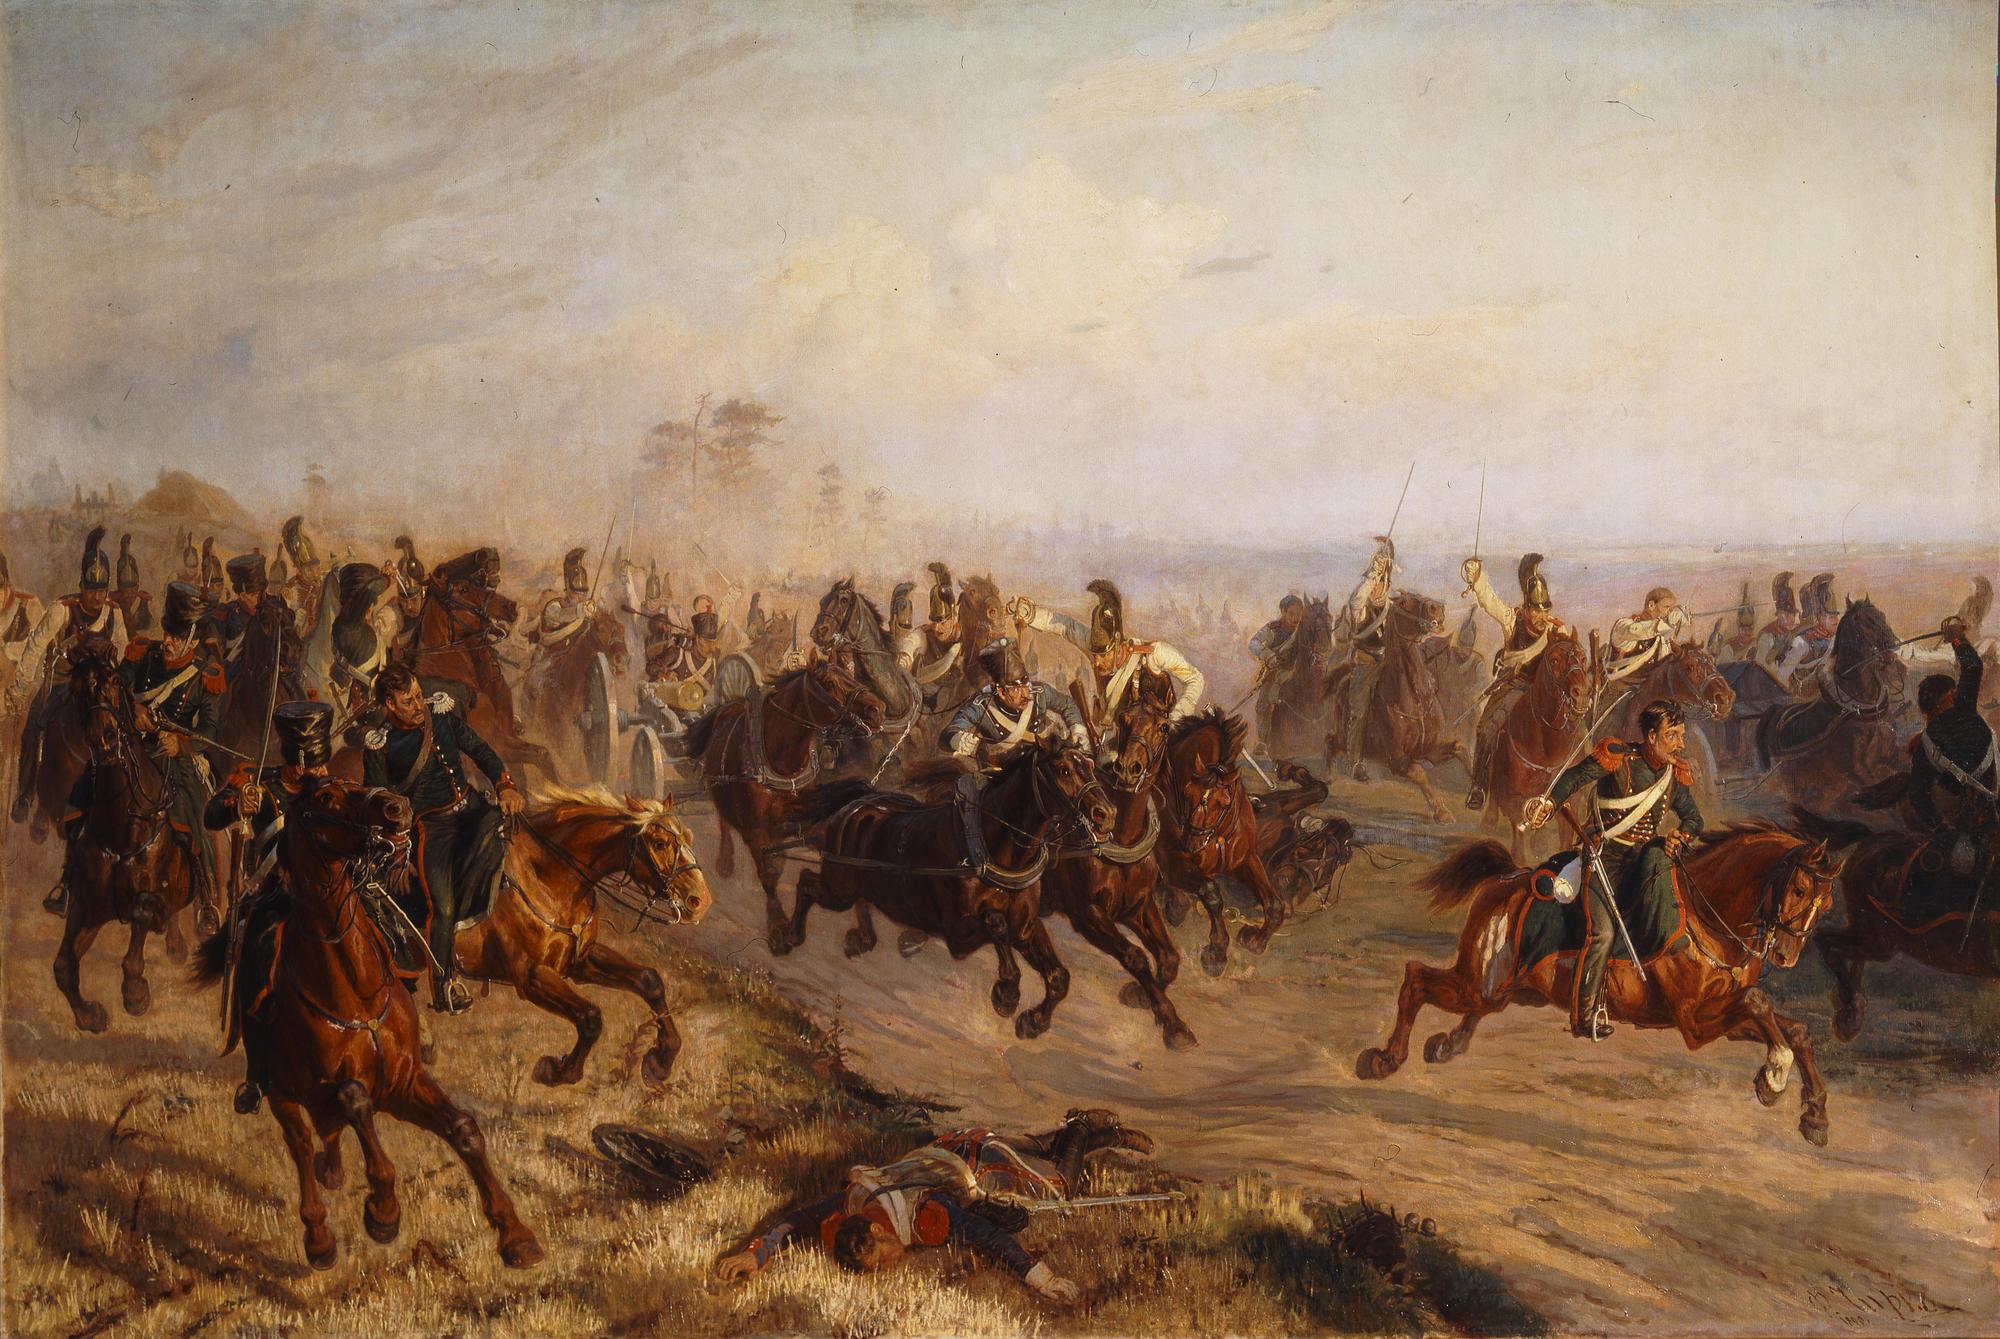 Cavalry_Battle_in_Polotsk_6_aug_1812.jpg